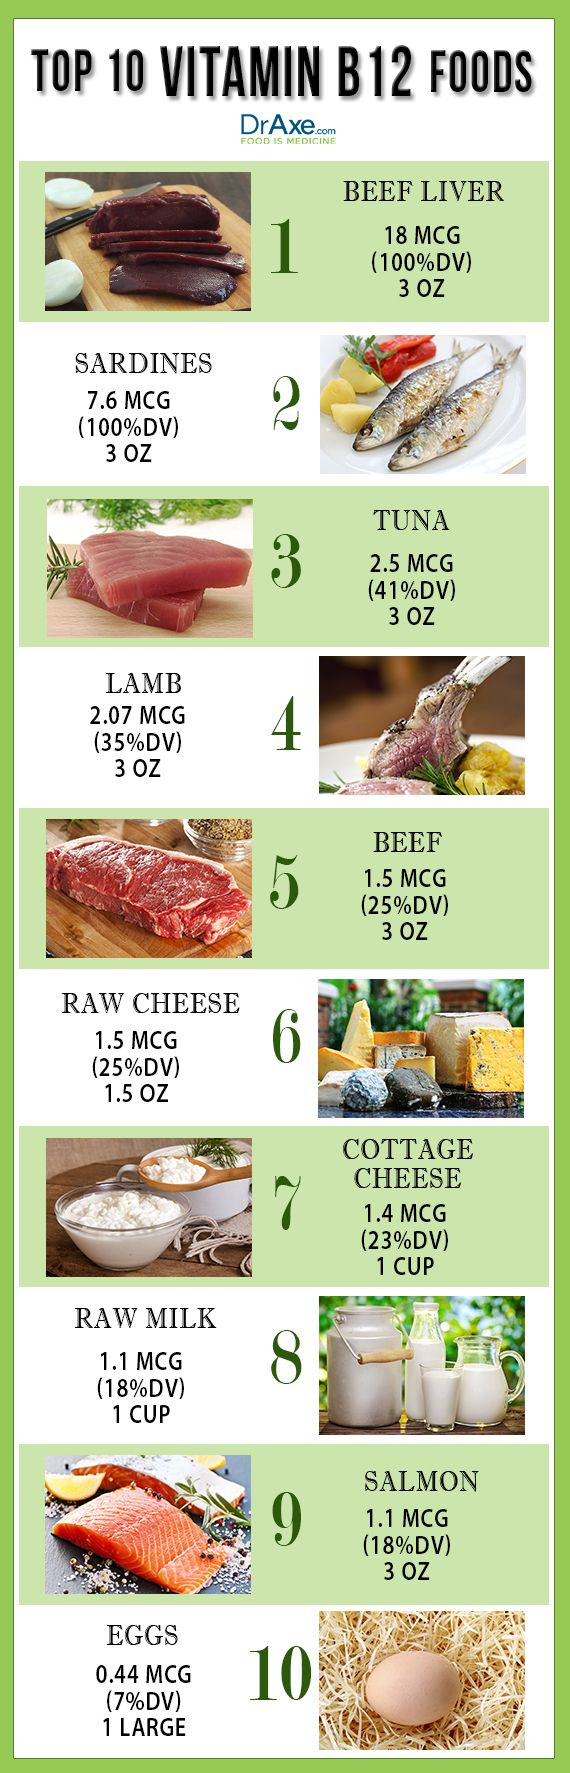 Top 10 Vitamin B12 Foods Health Pinterest Health